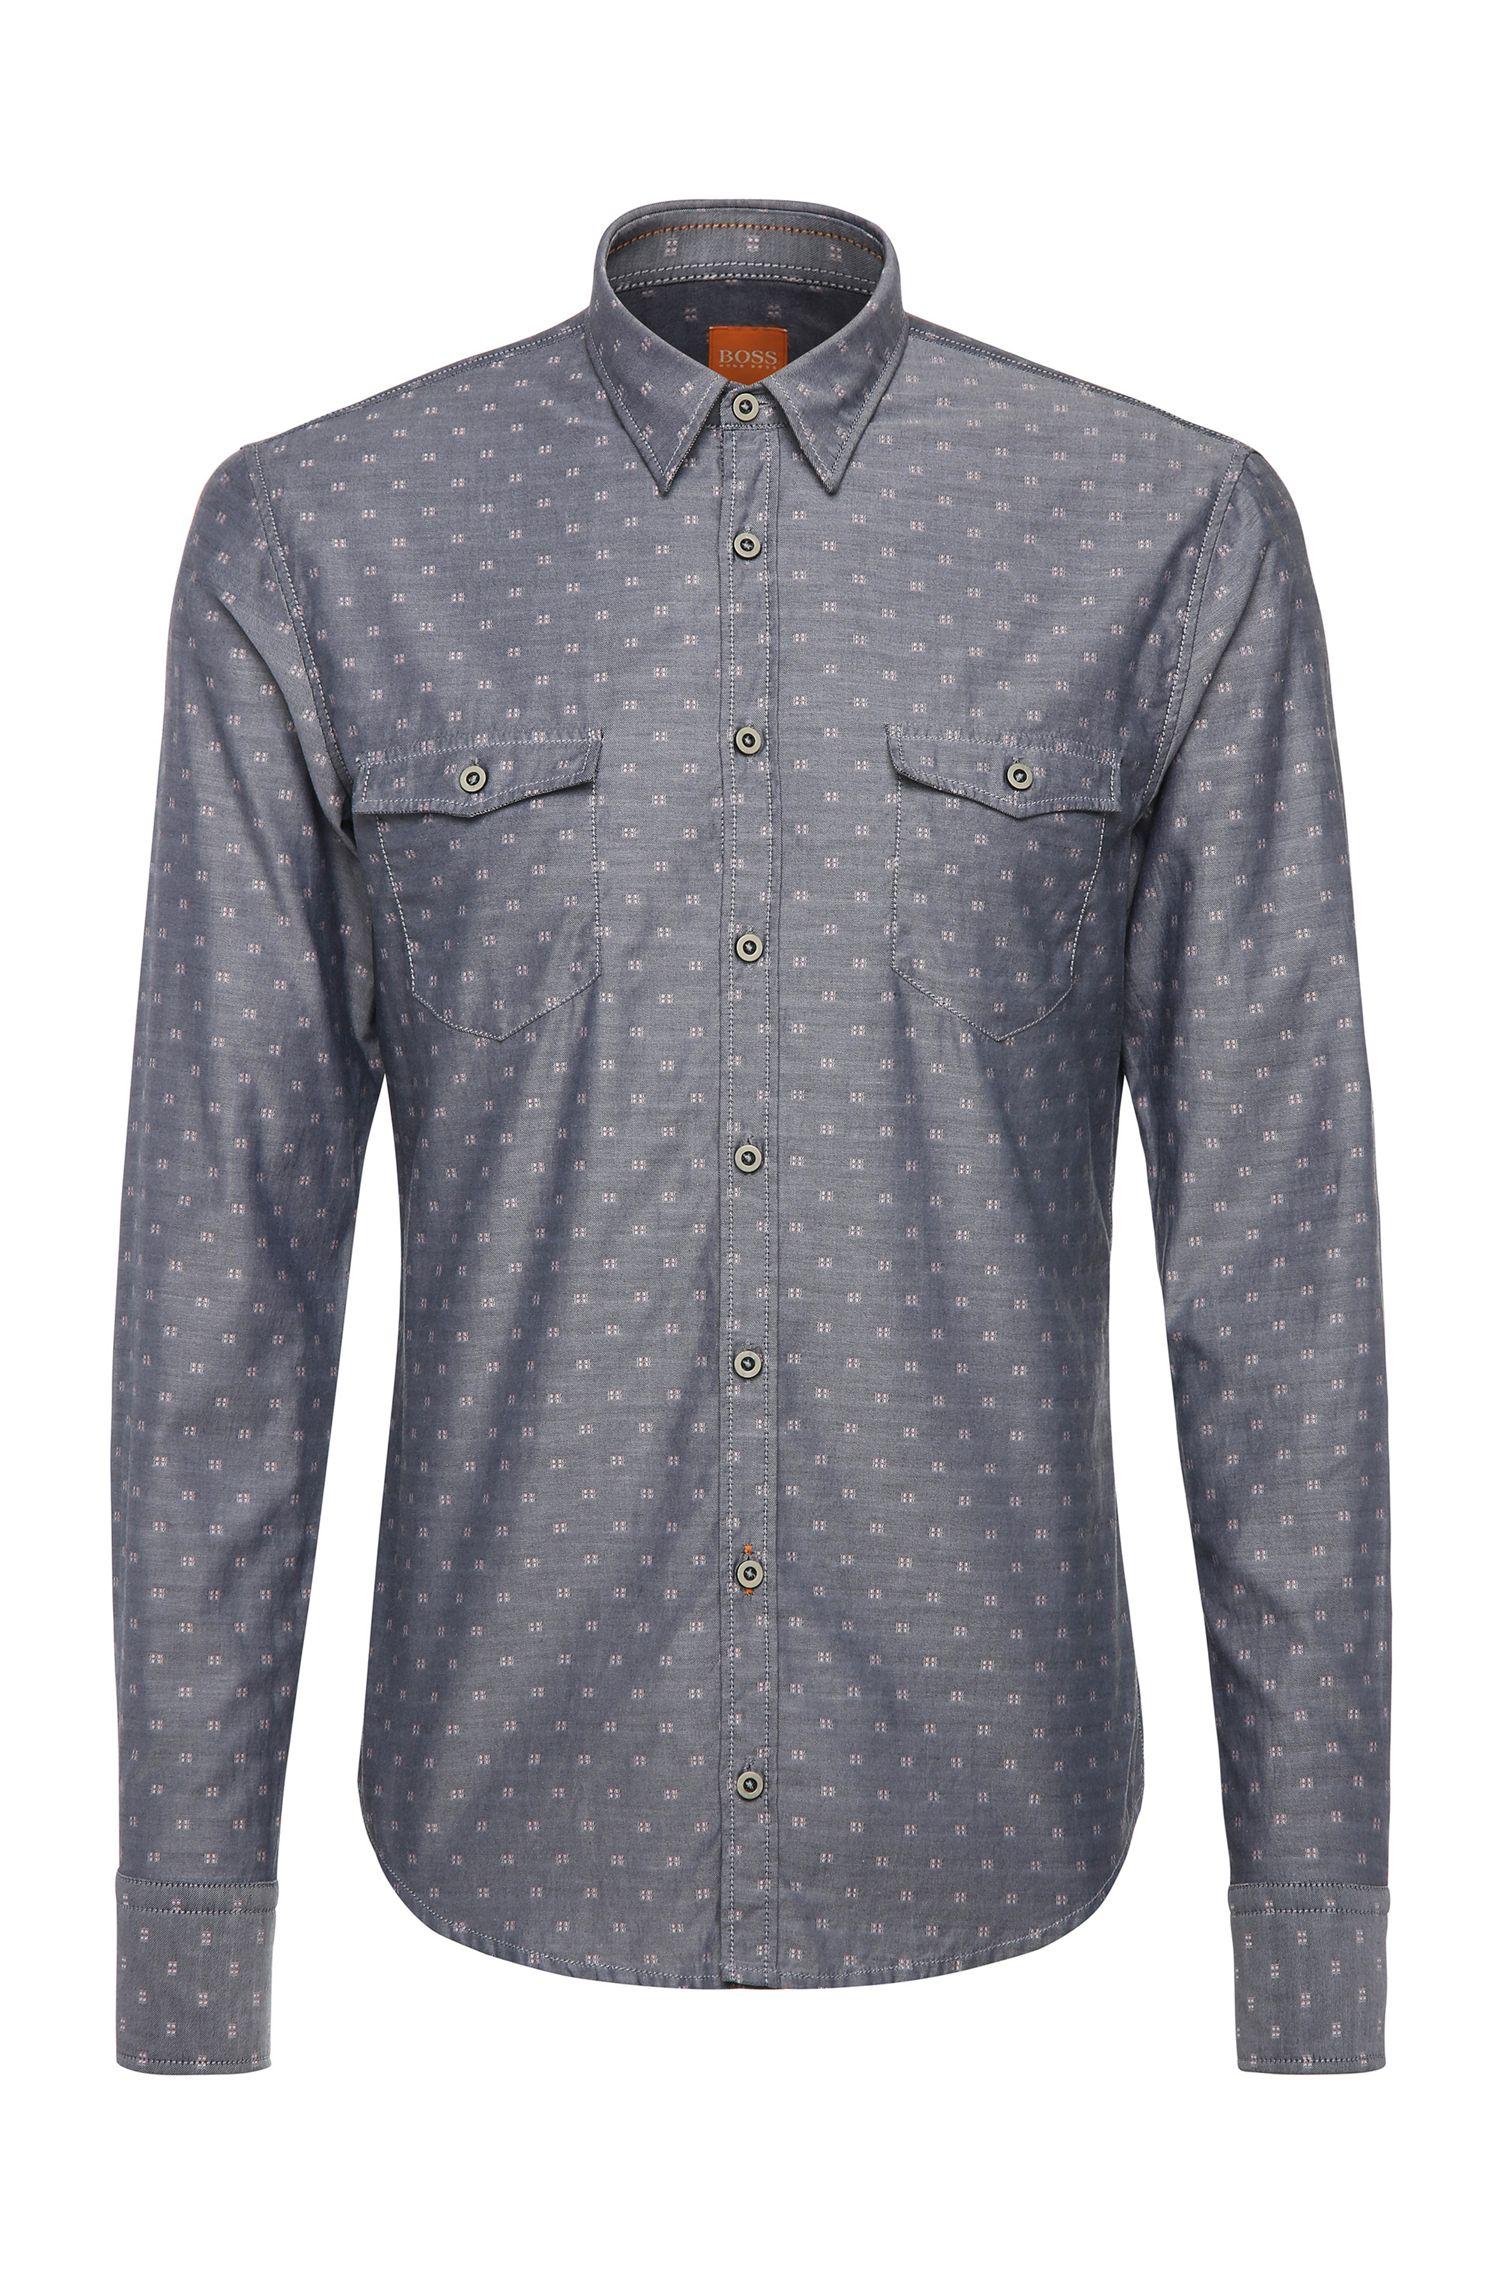 'EdoslimE' | Slim Fit, Cotton Button Down Shirt